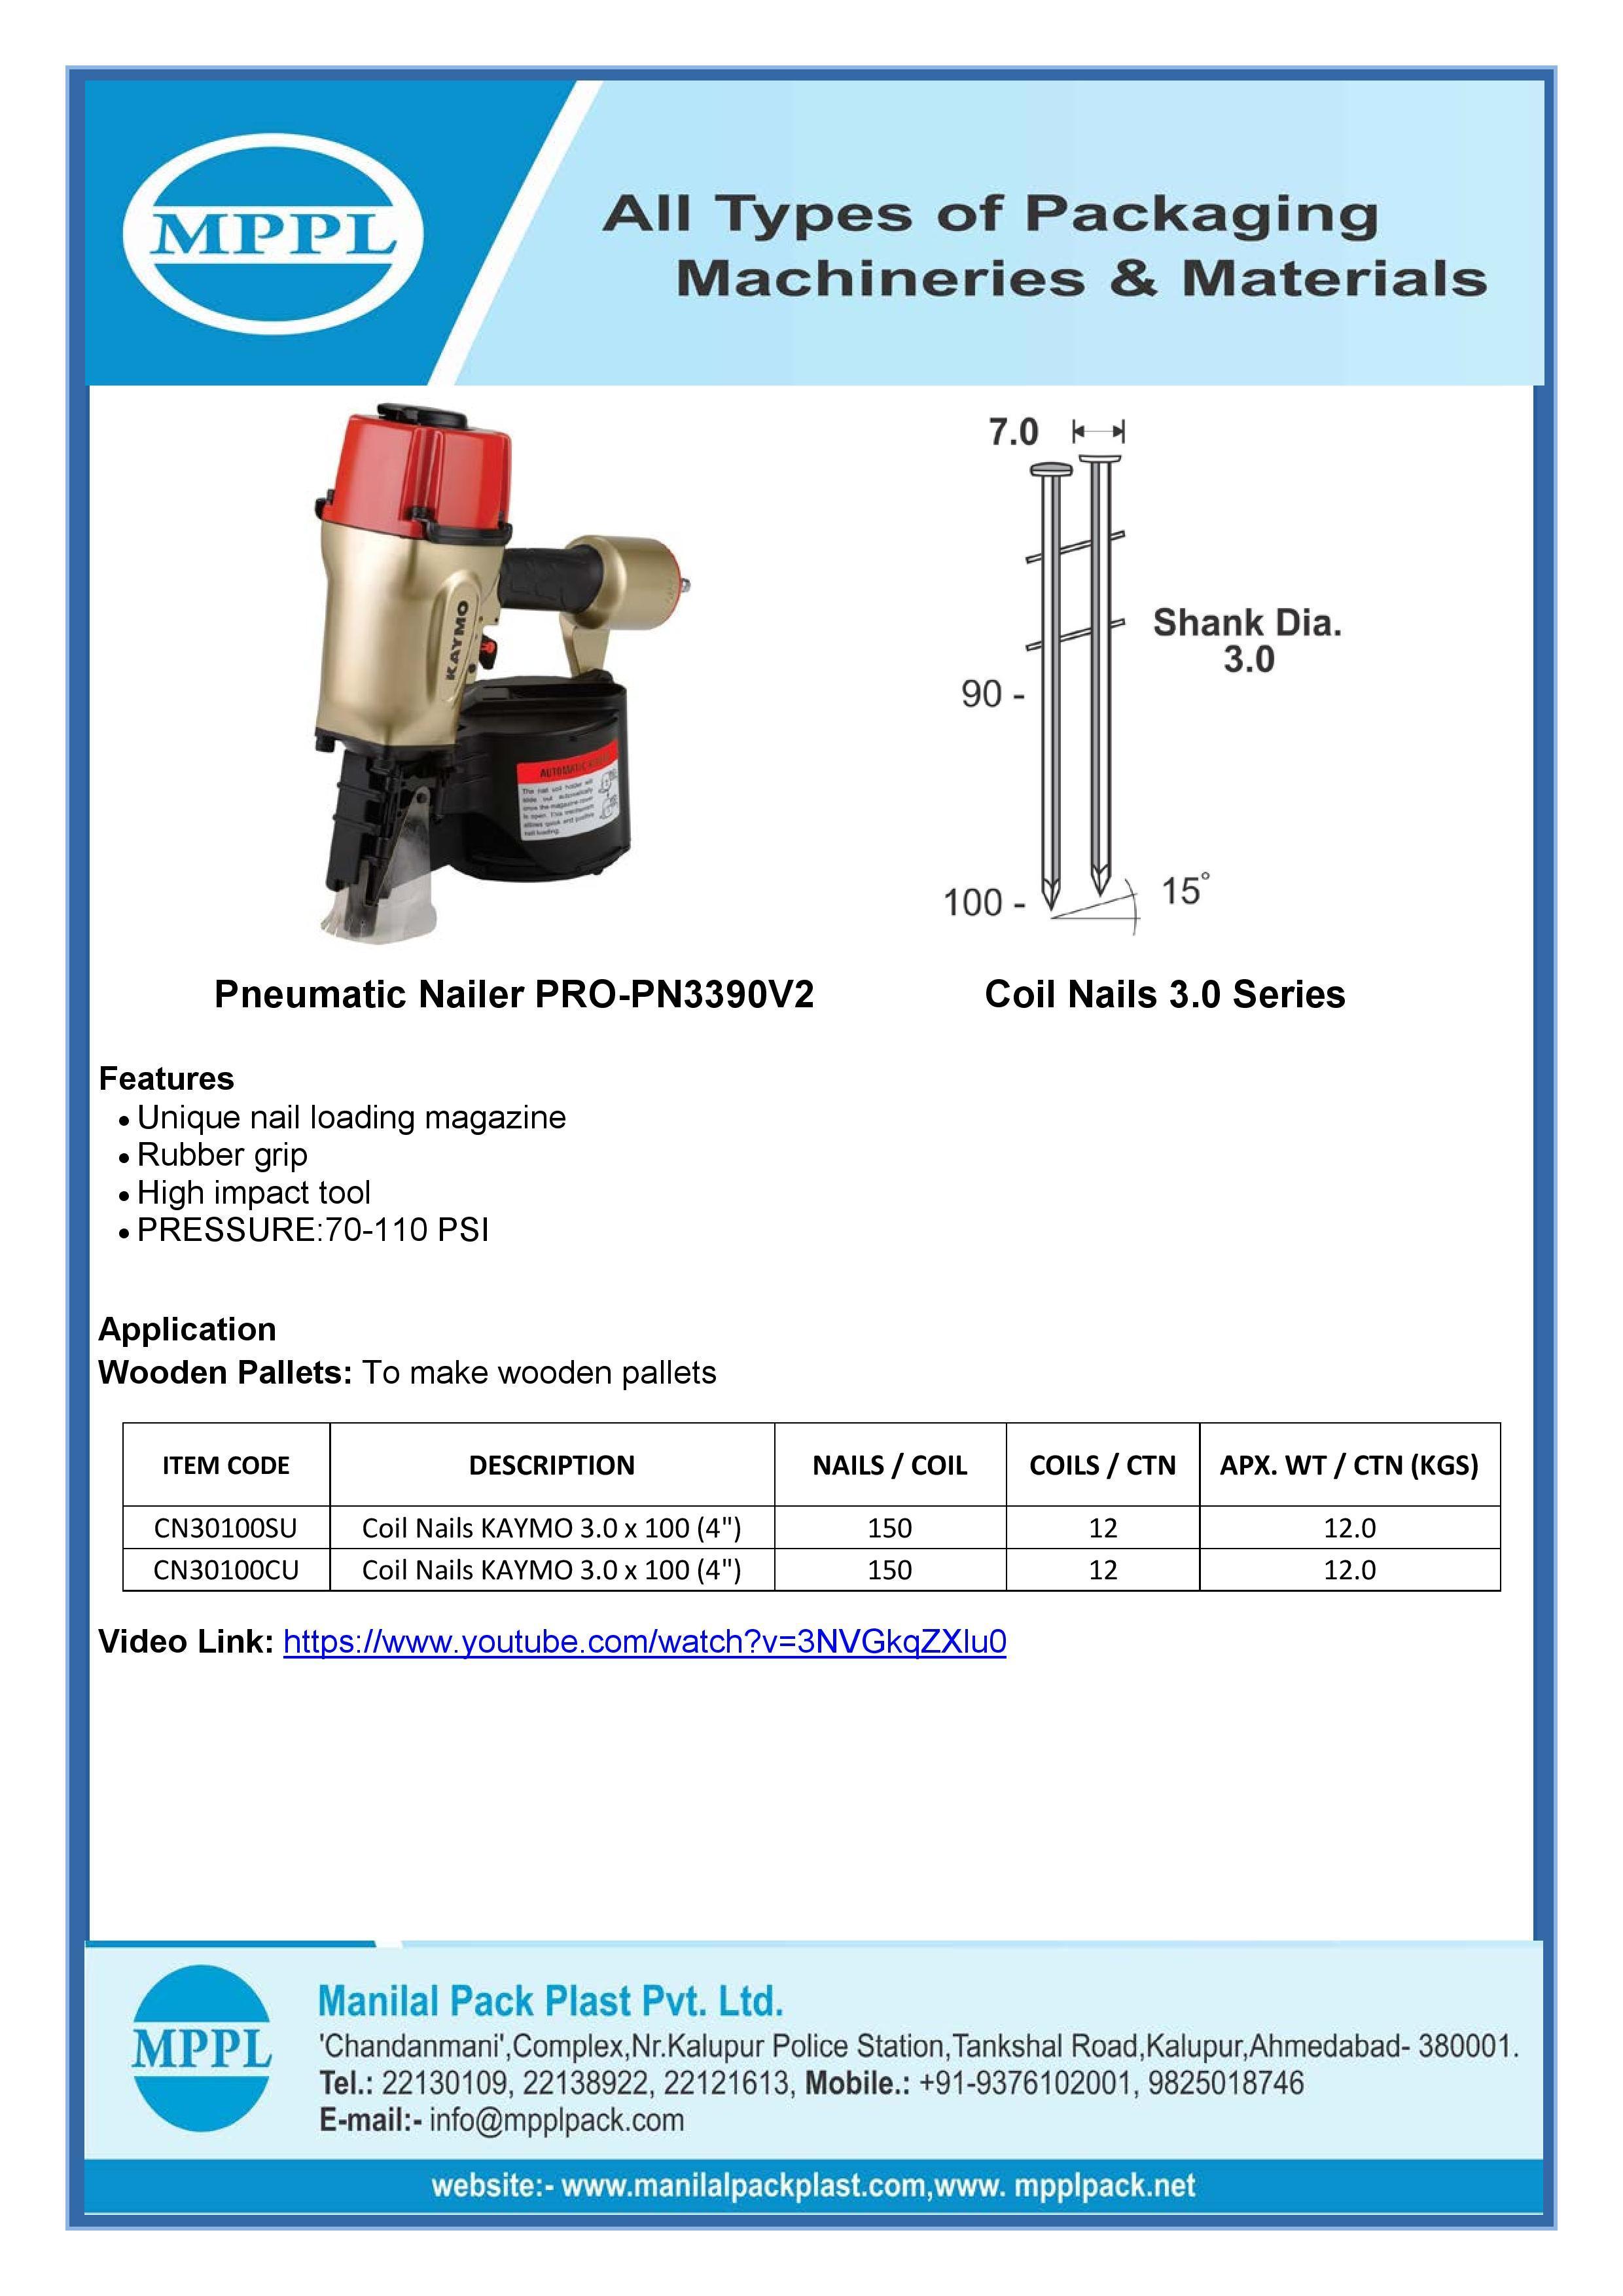 Pneumatic Nailer PRO-PN3390V2